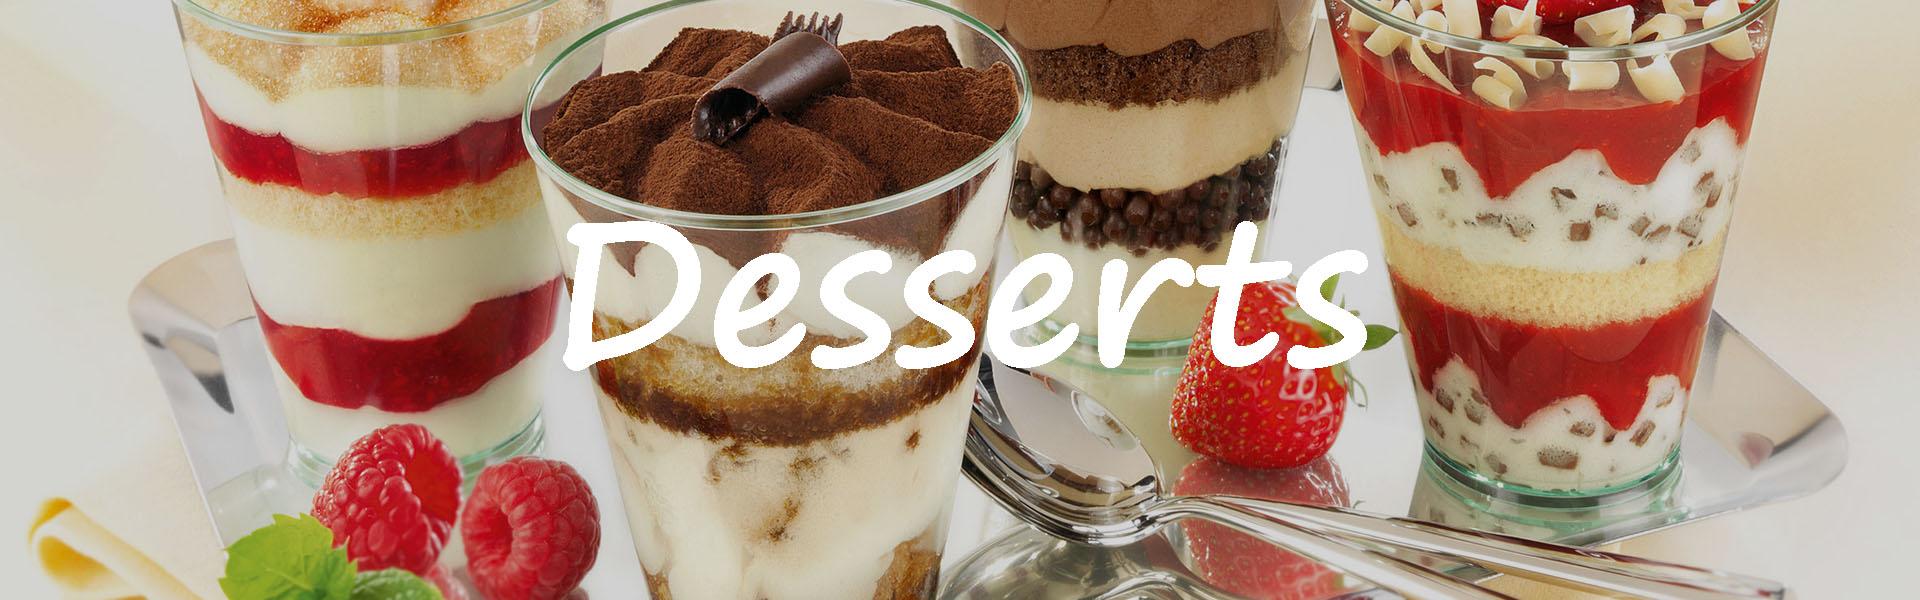 web-ready-desserts-3